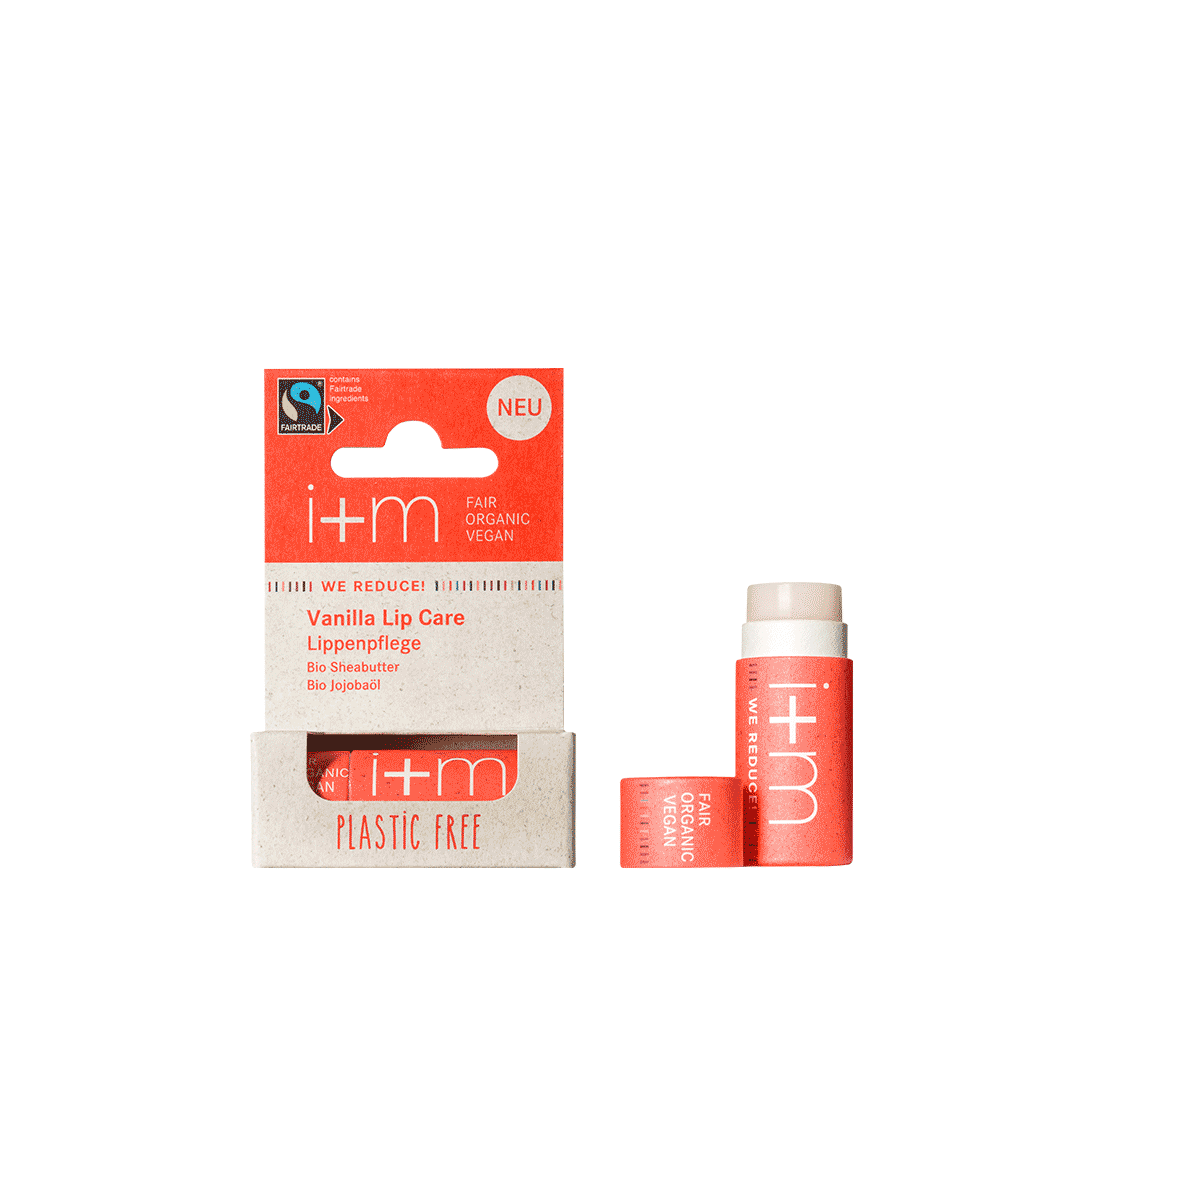 We Reduce Vanilla Lip Care